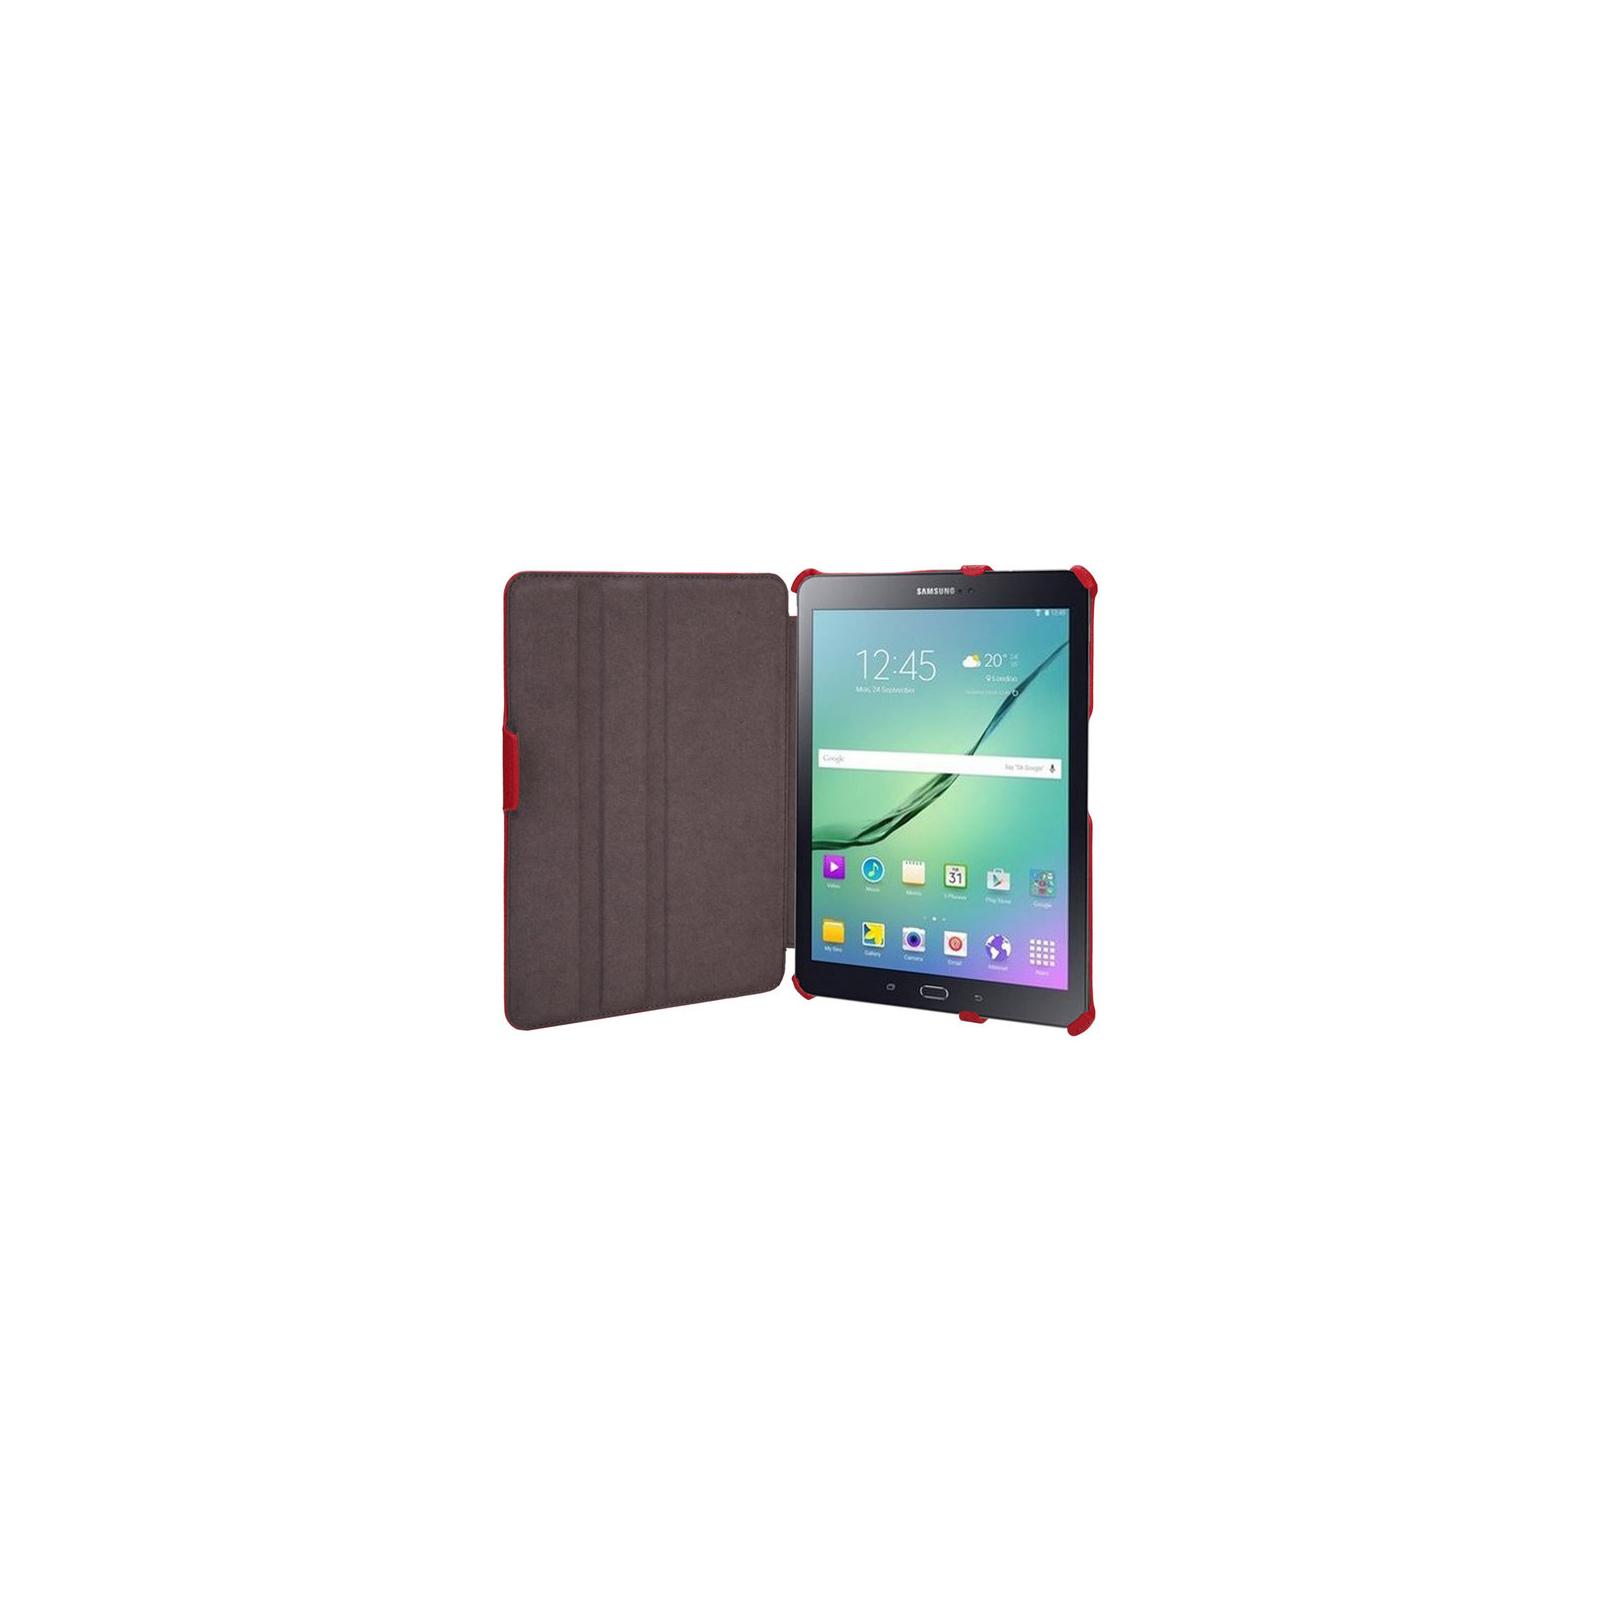 Чехол для планшета AirOn для Samsung Galaxy Tab S 2 9.7 red (4822352777456) изображение 8